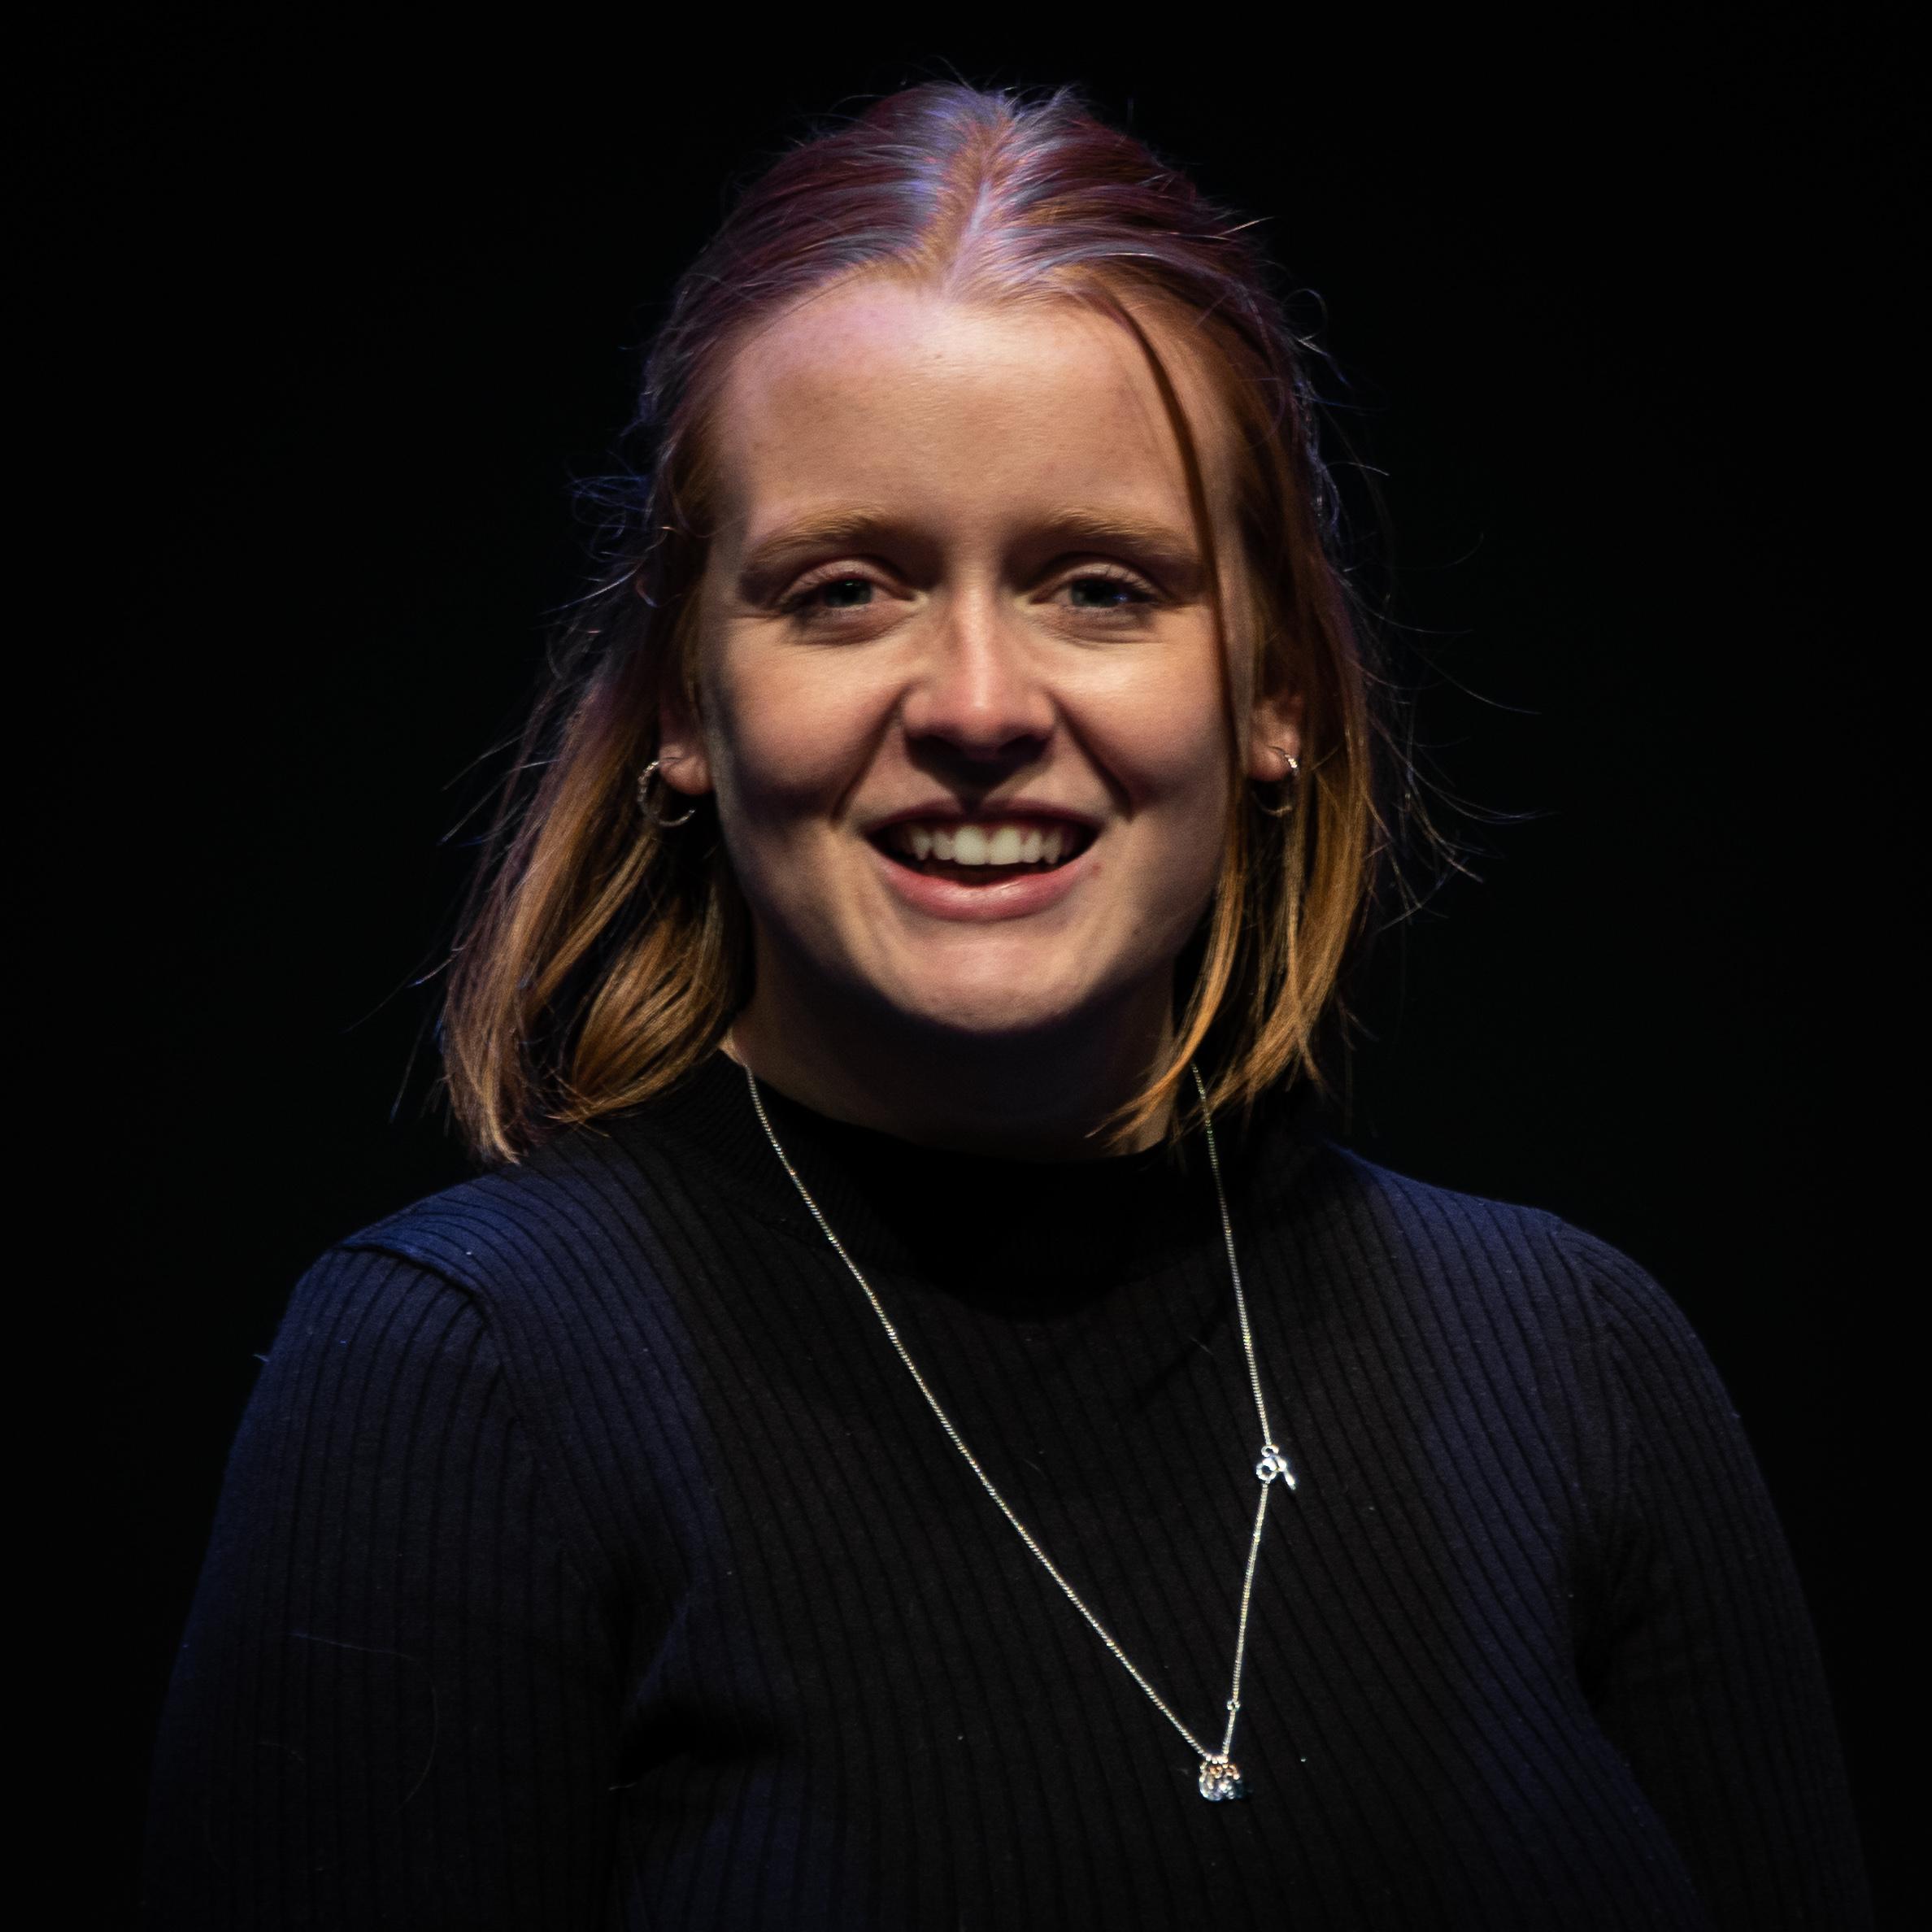 Producer - Meg Gerrard